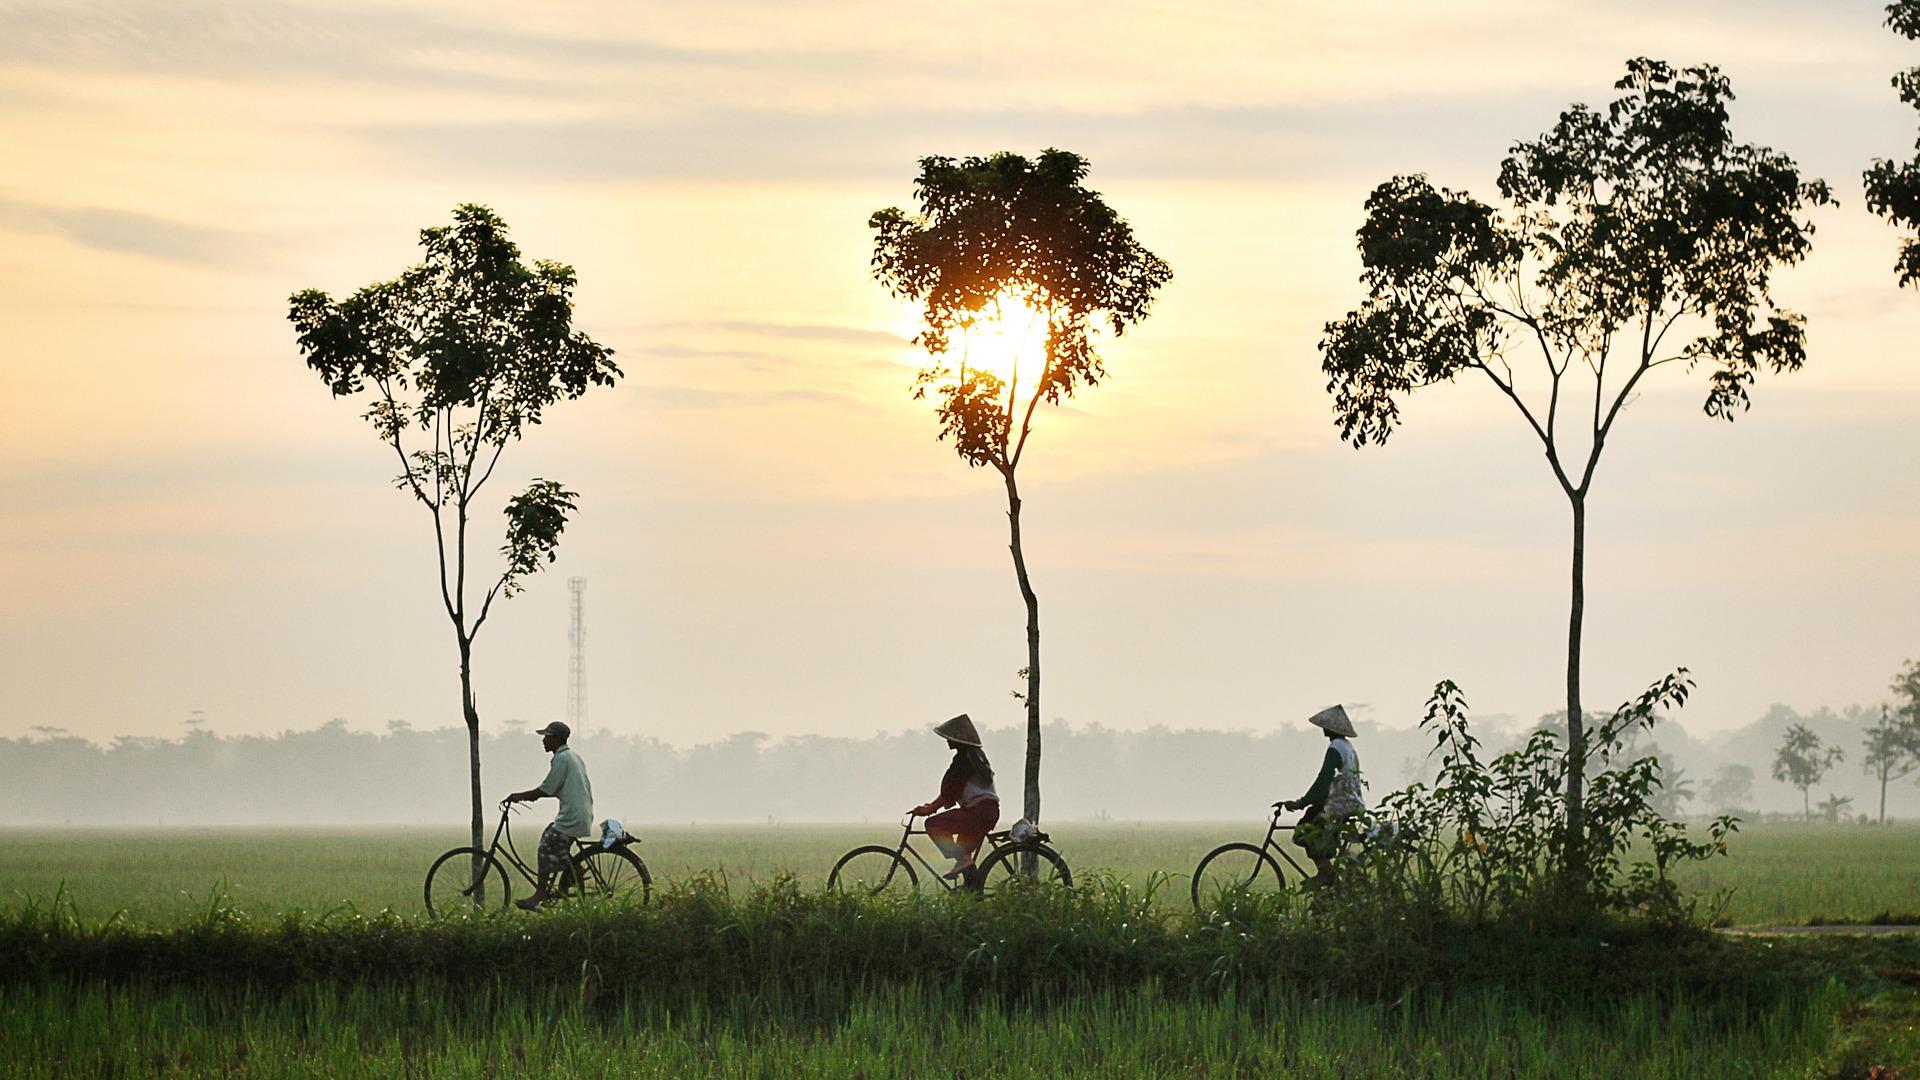 Bicycle Riding 947336 1920